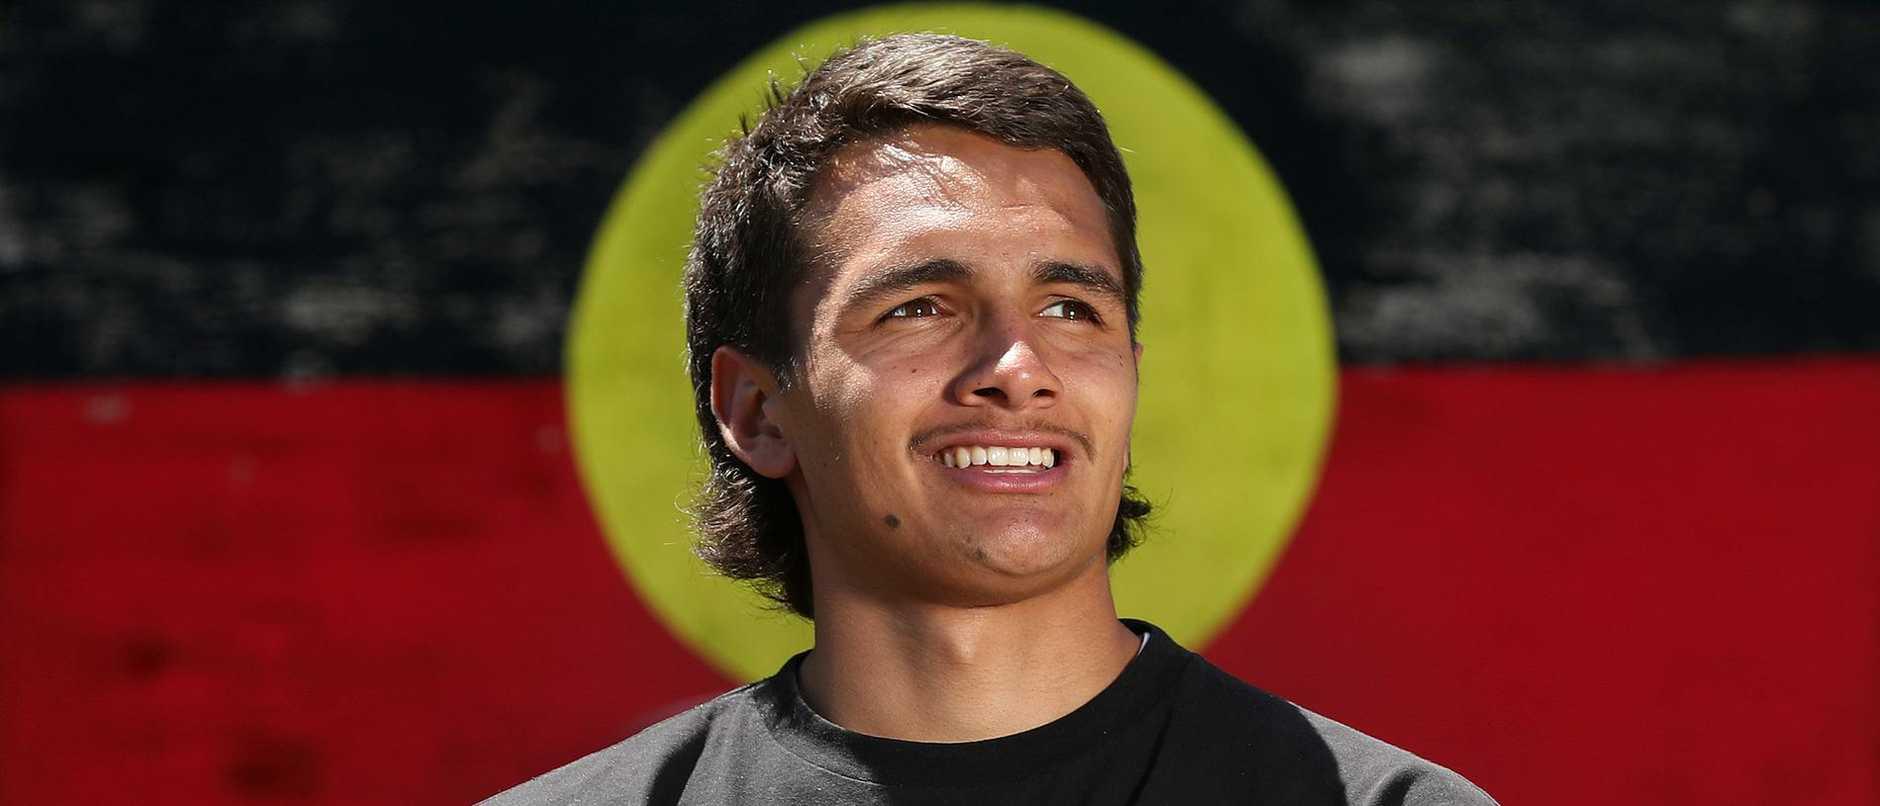 AFL draft: Jamarra Ugle-Hagan to solve Western Bulldogs Indigenous shortfall